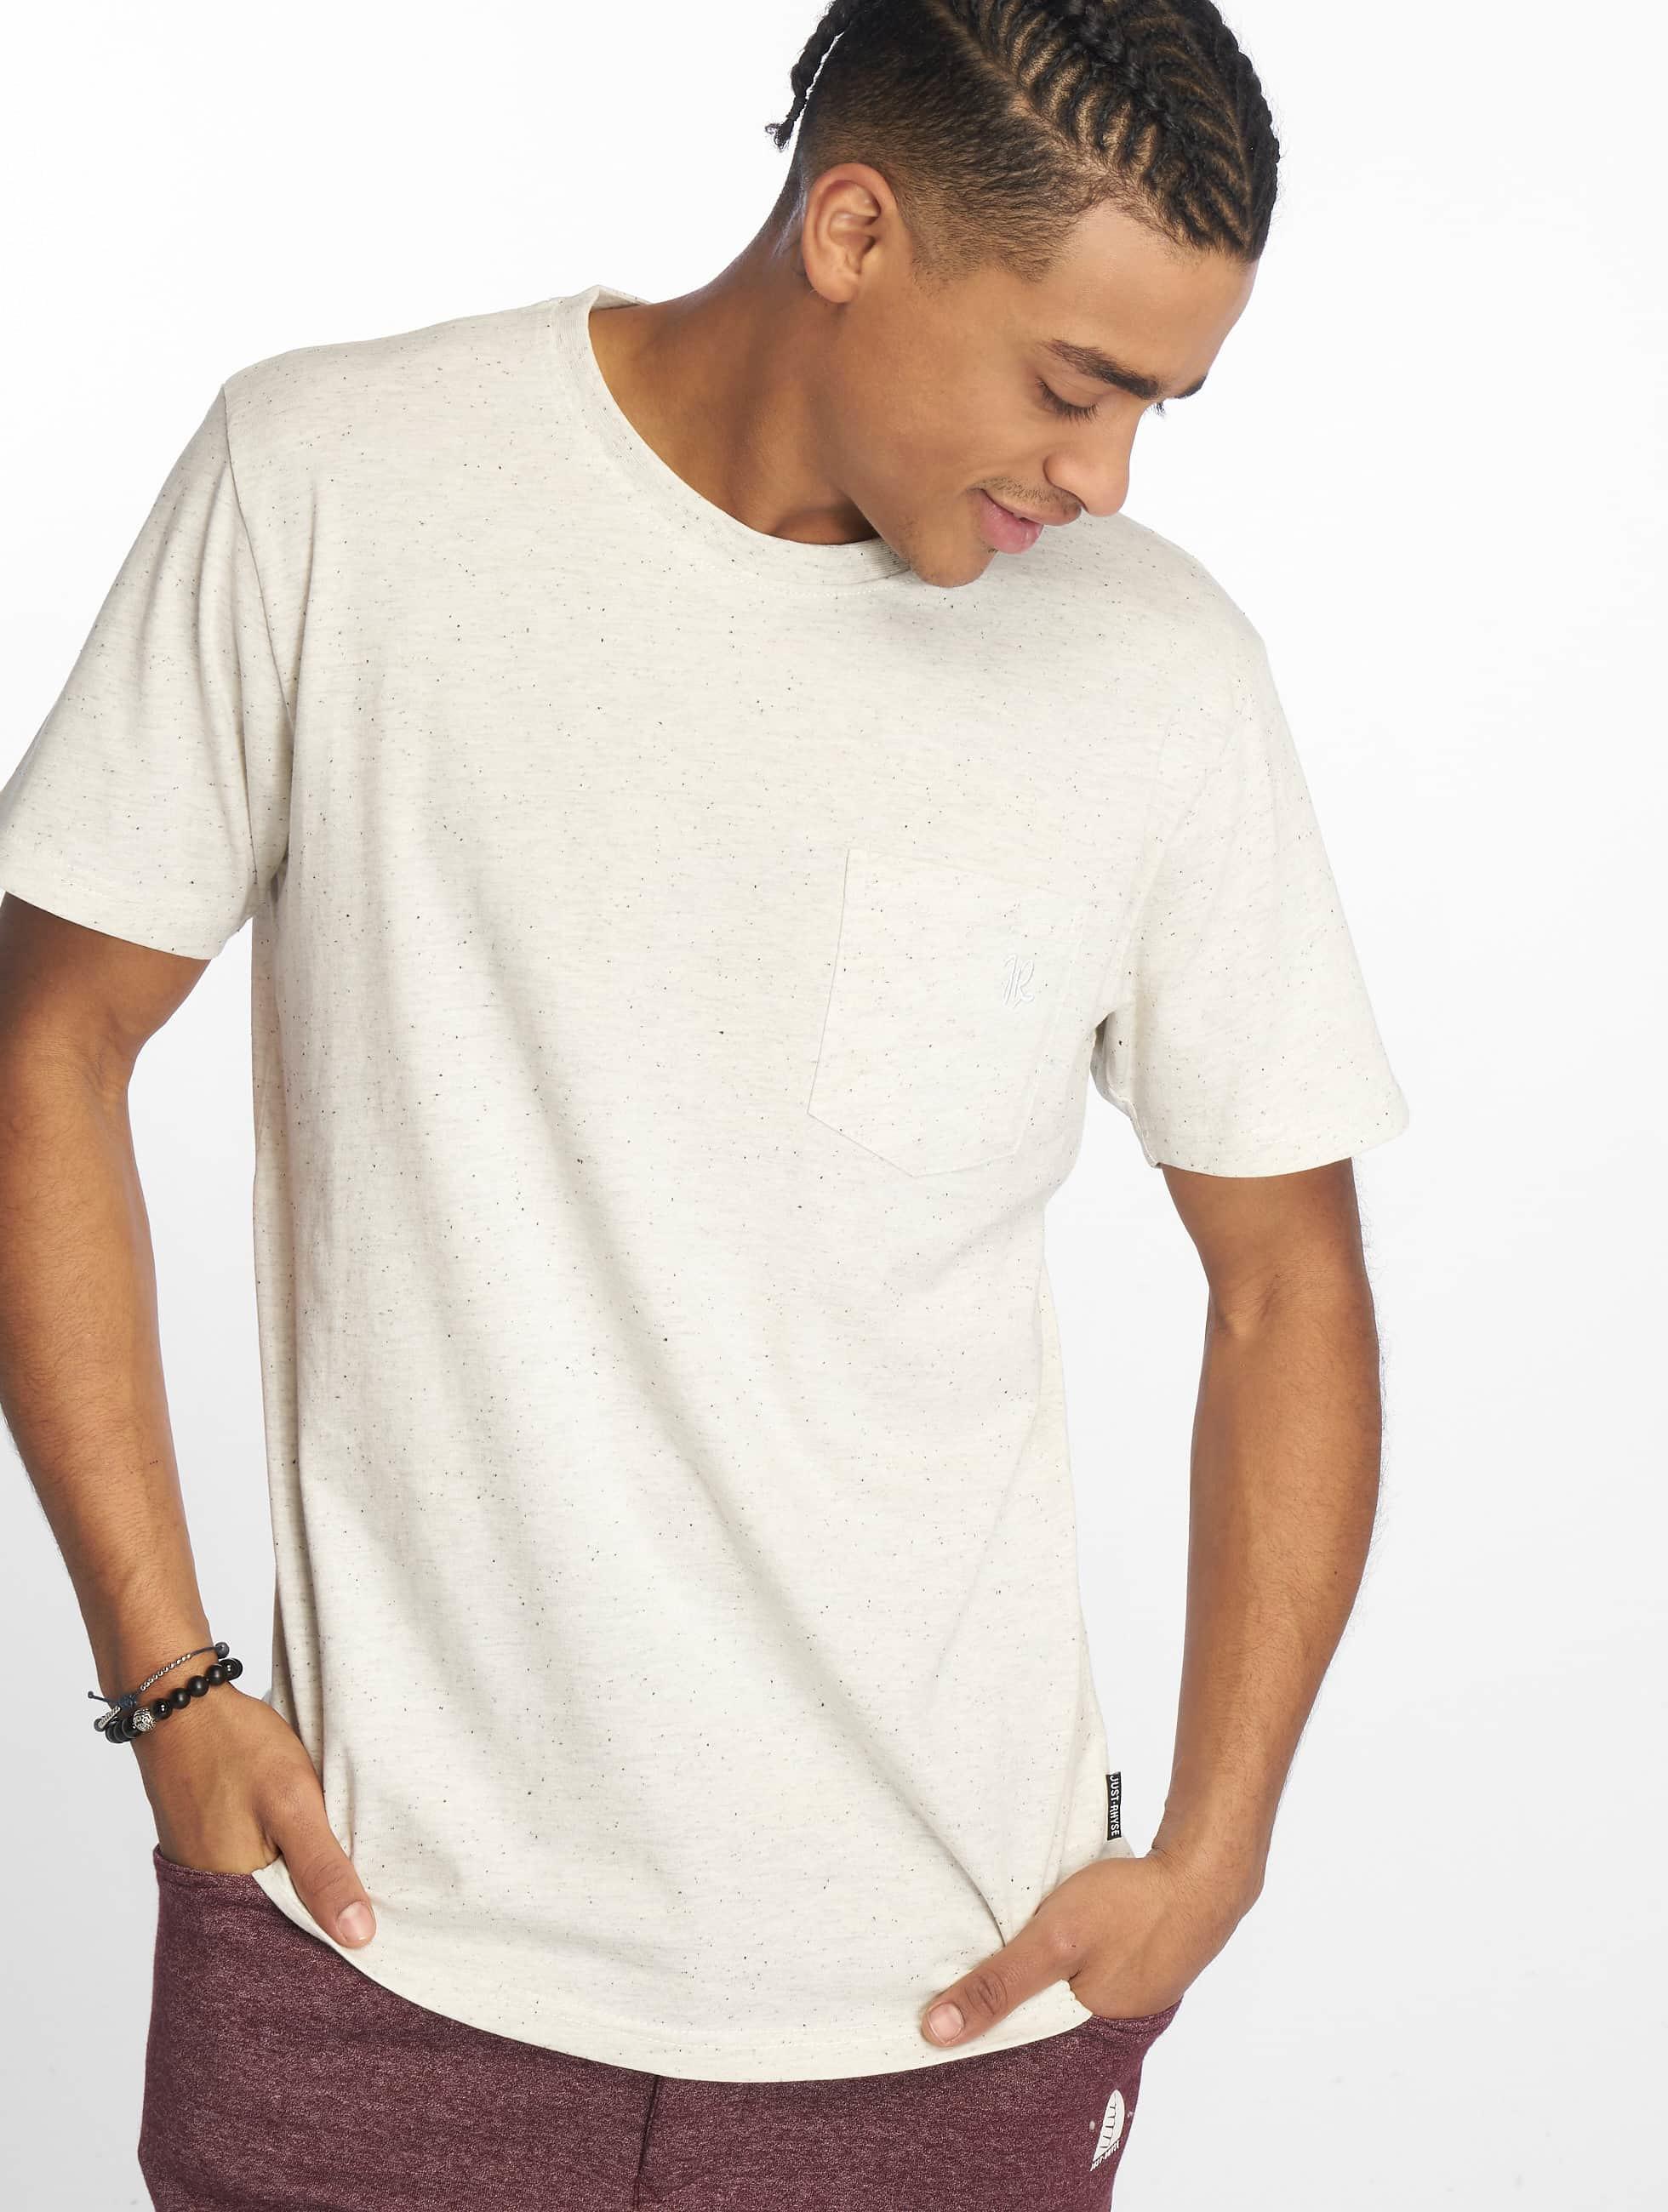 Just Rhyse / T-Shirt Sarasota in white 3XL